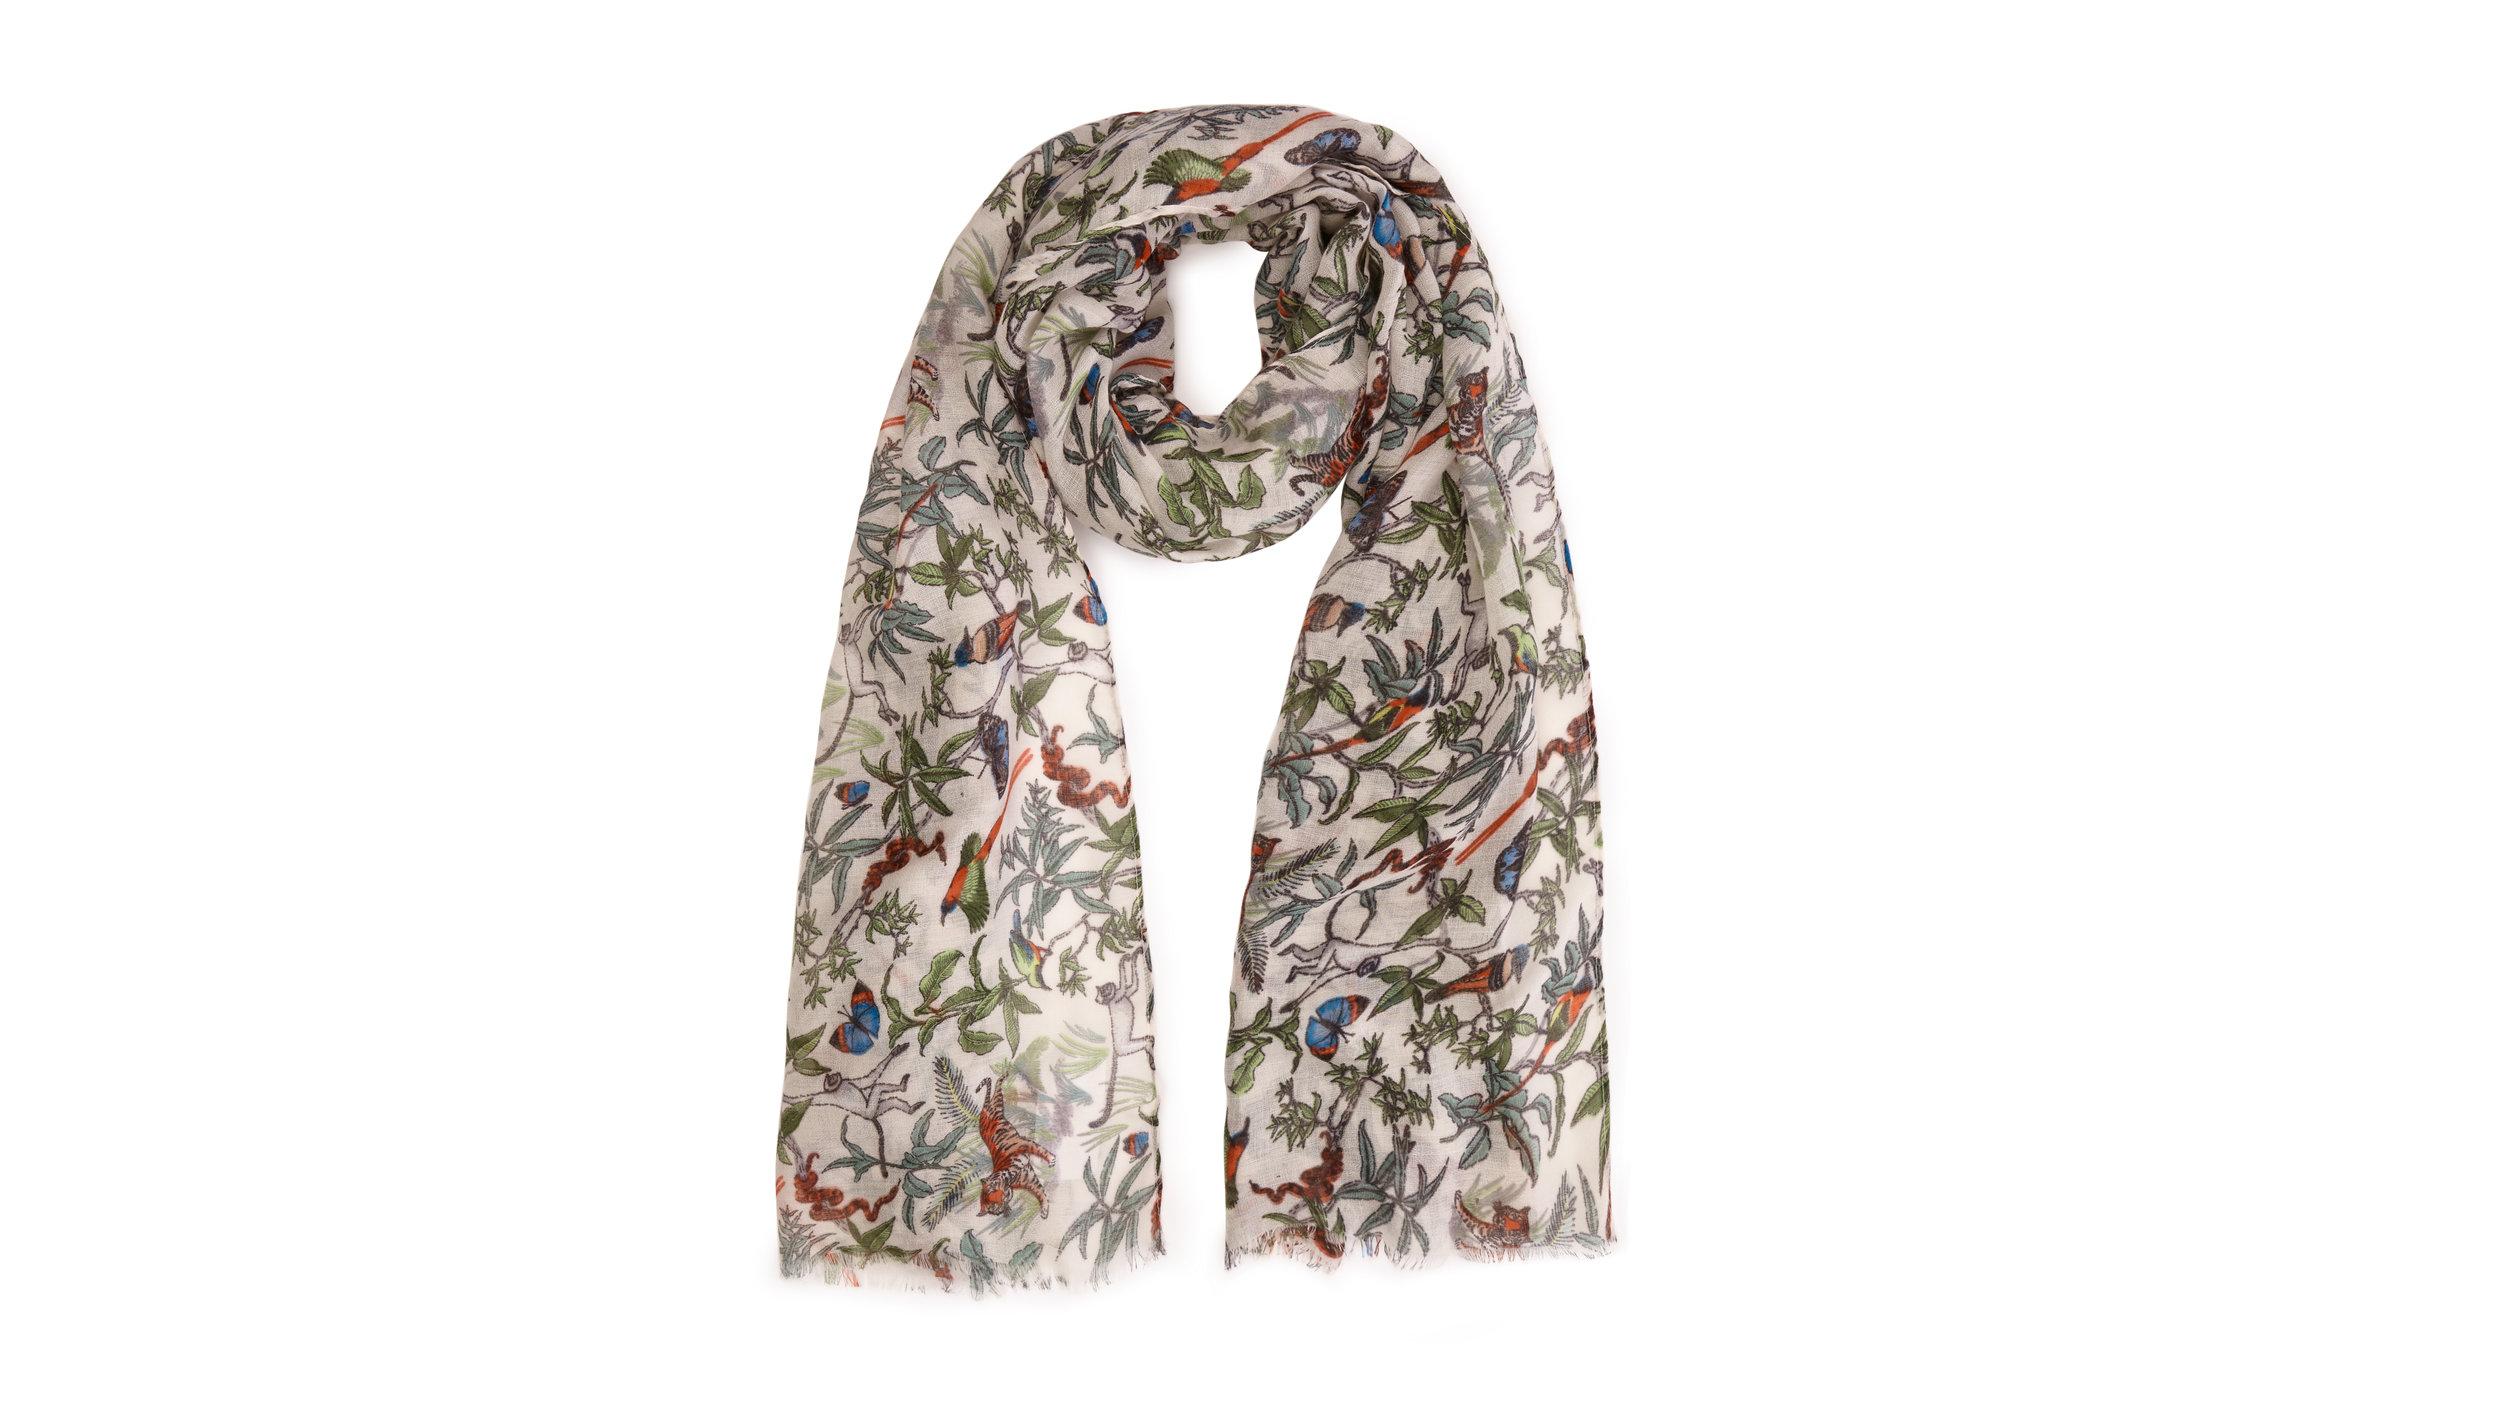 animal-print-scarf-oasis-london-zoo-zsl-cream